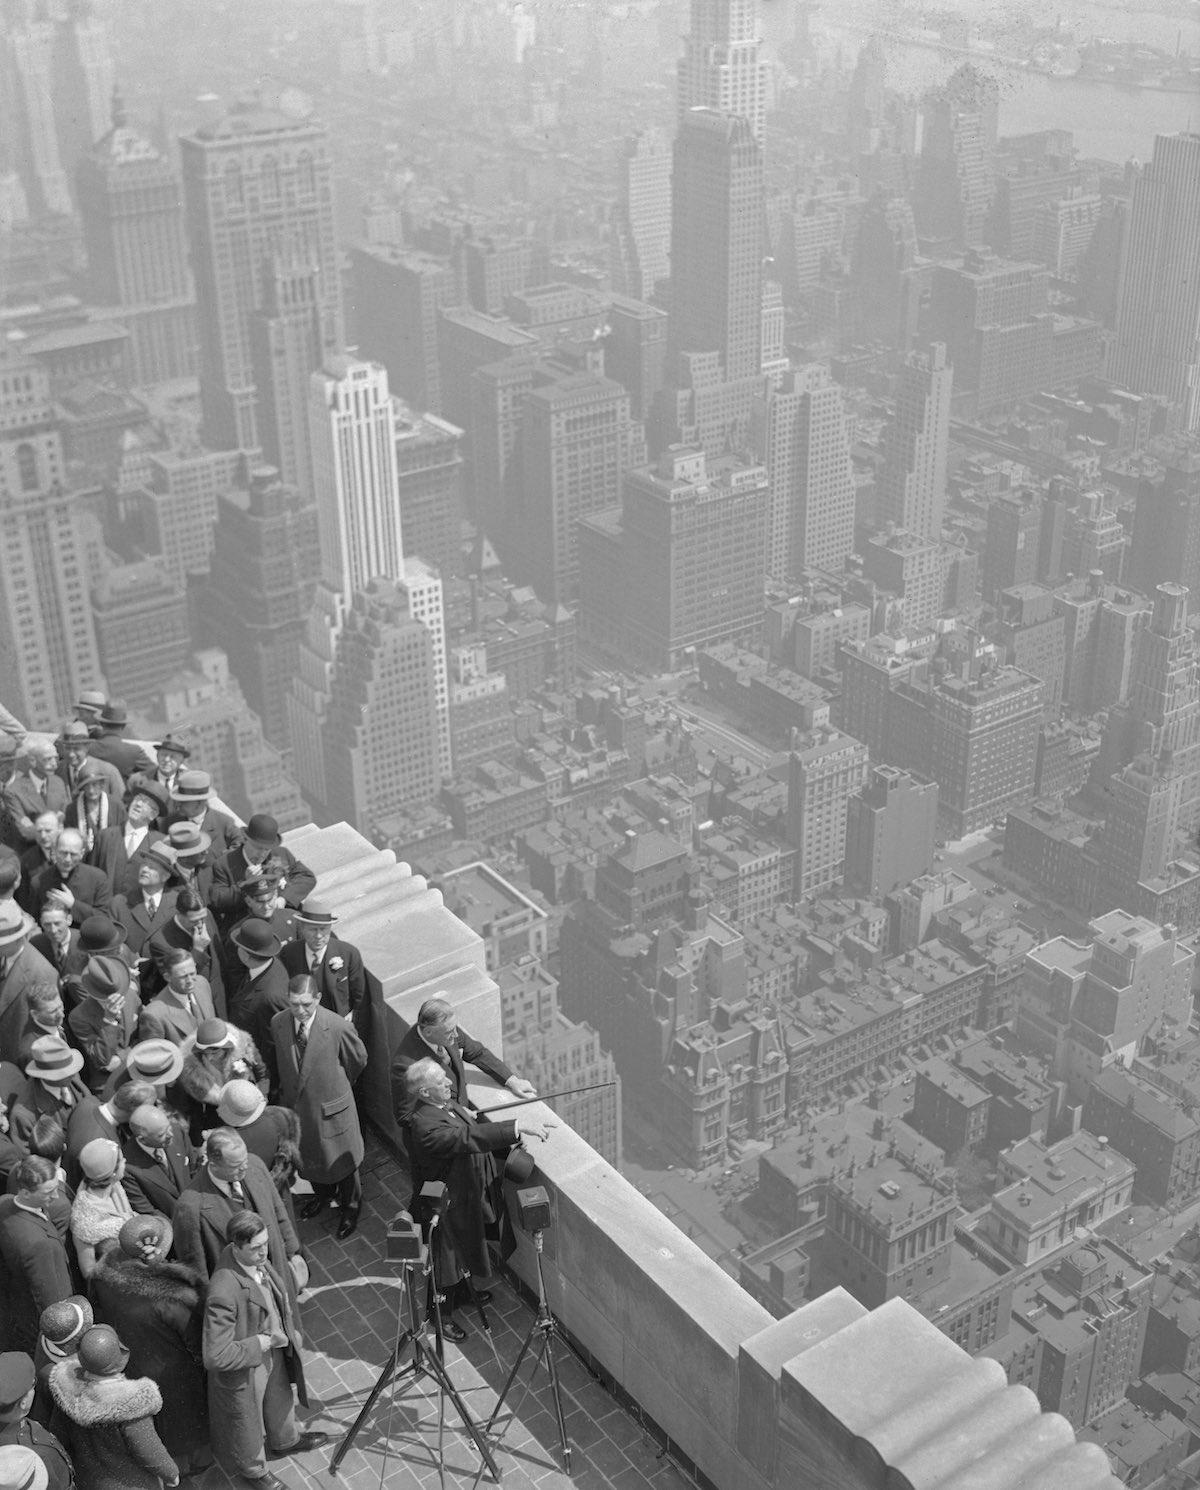 Empire State Building Dedication Ceremonies on Rooftop